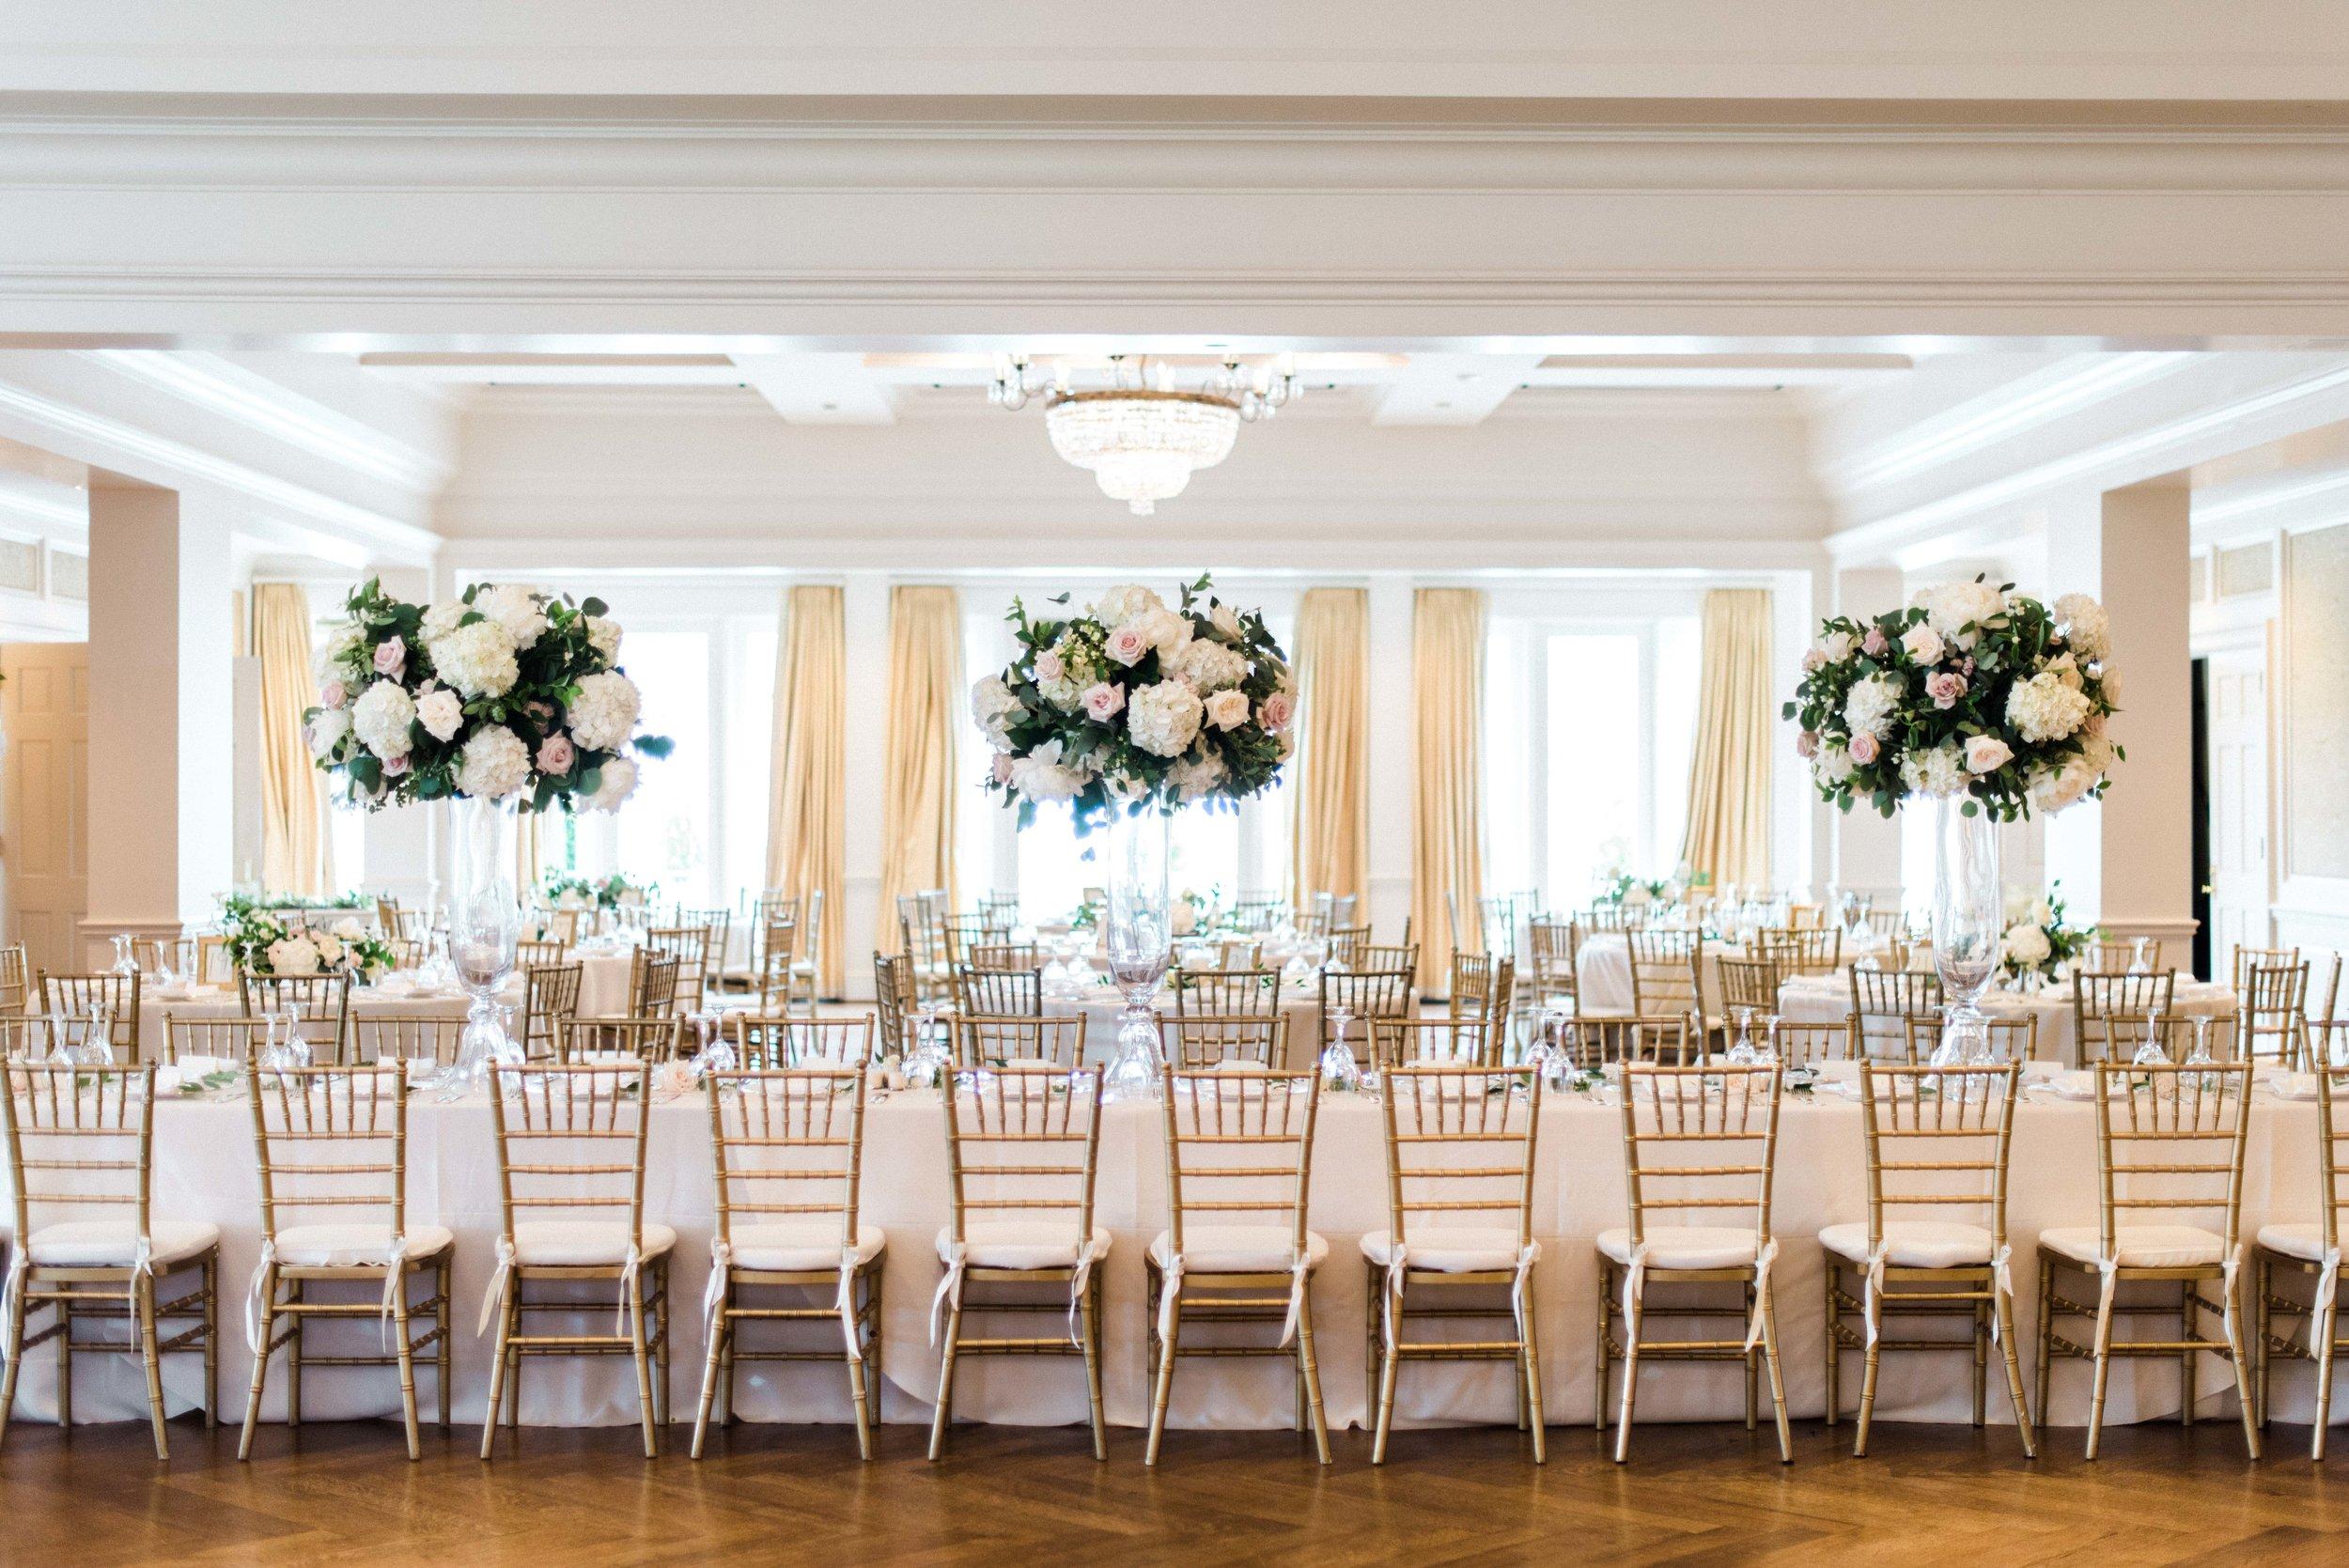 Fine-Art-Film-Houston-Wedding-Photographer-Best-Top-Luxury-Texas-Austin-Dallas-Destination-Dana-Fernandez-Photography-River-Oaks-Country-Club-South-Main-Baptist-Ceremony-Reception-Wedding-15.jpg